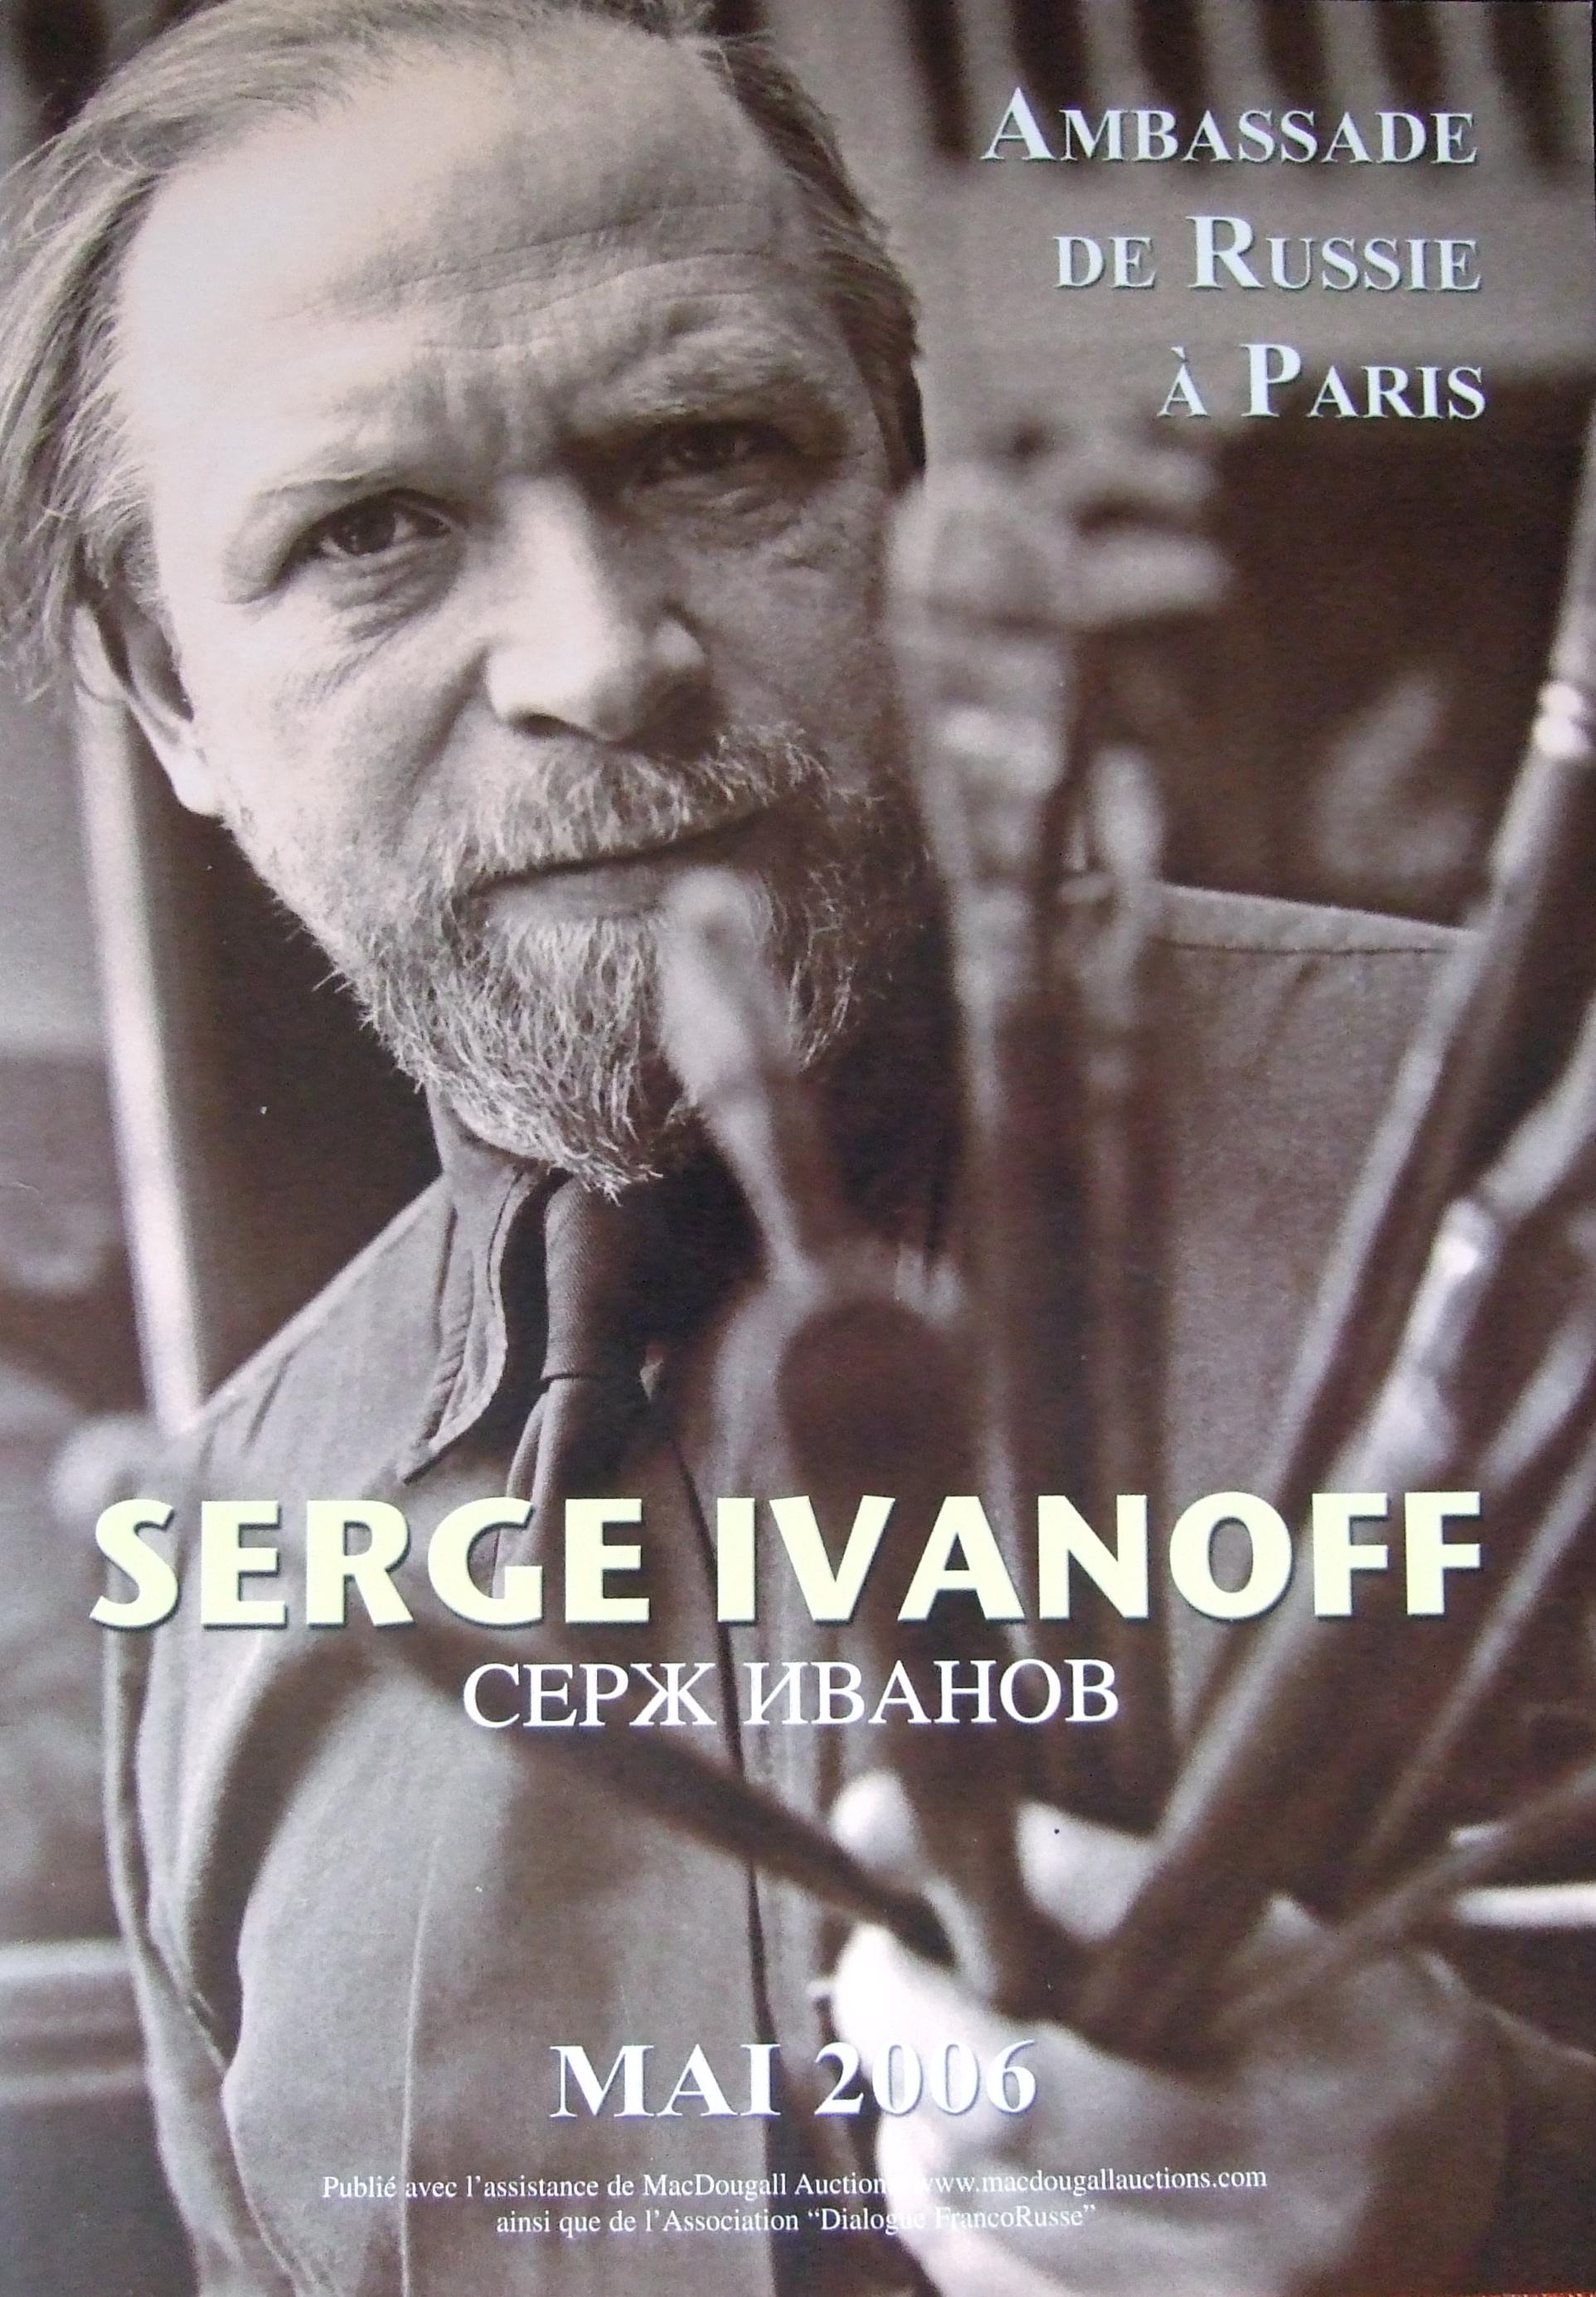 Serge Ivanoff